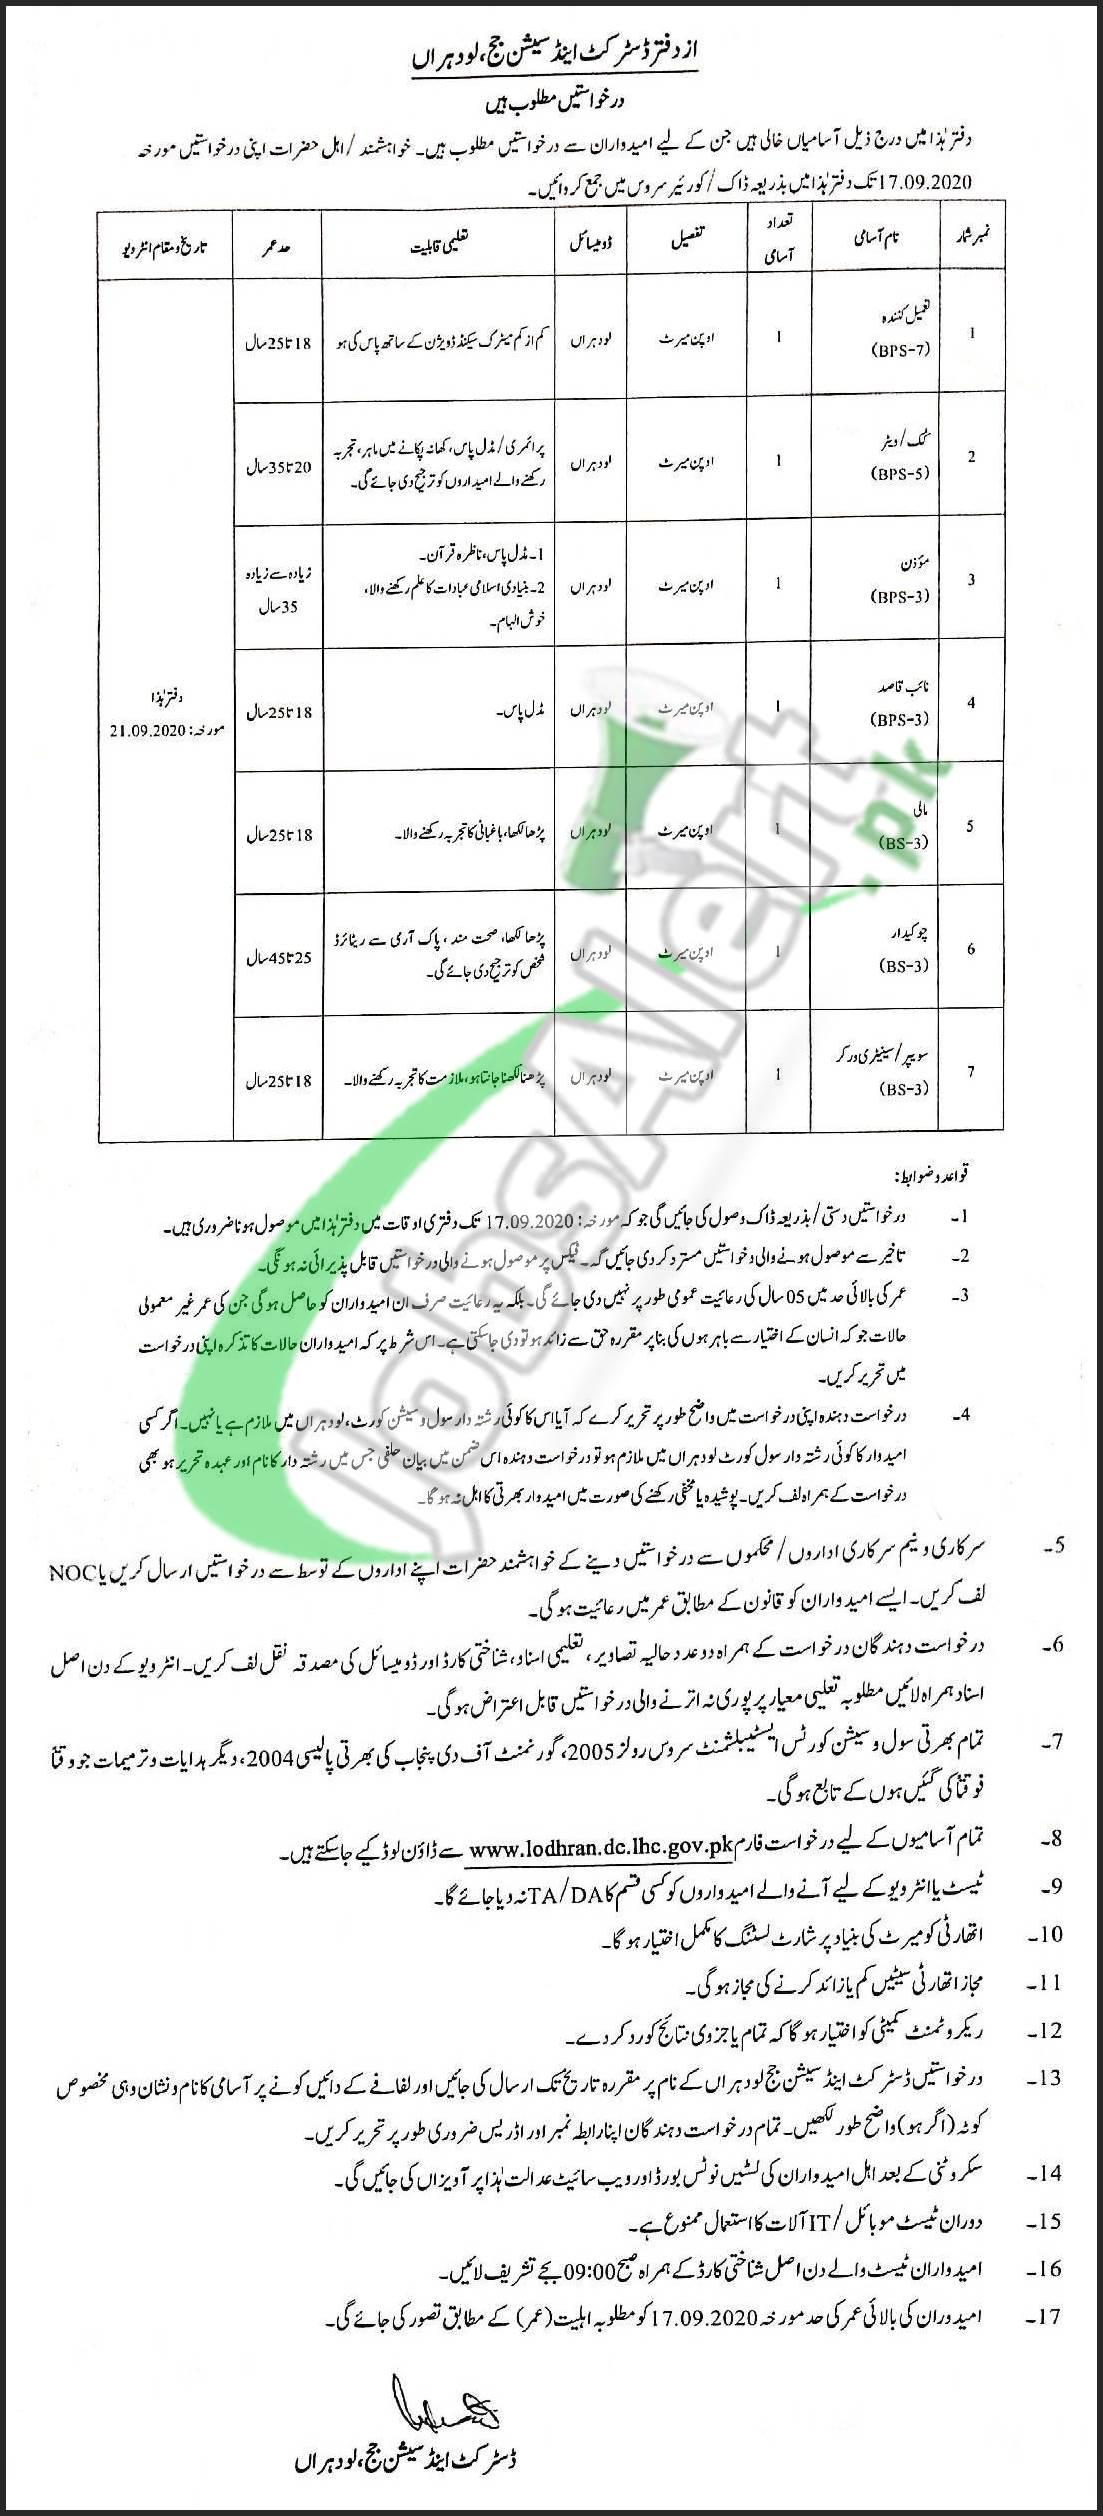 Session Court Lodhran Jobs Application Form 2020 Download